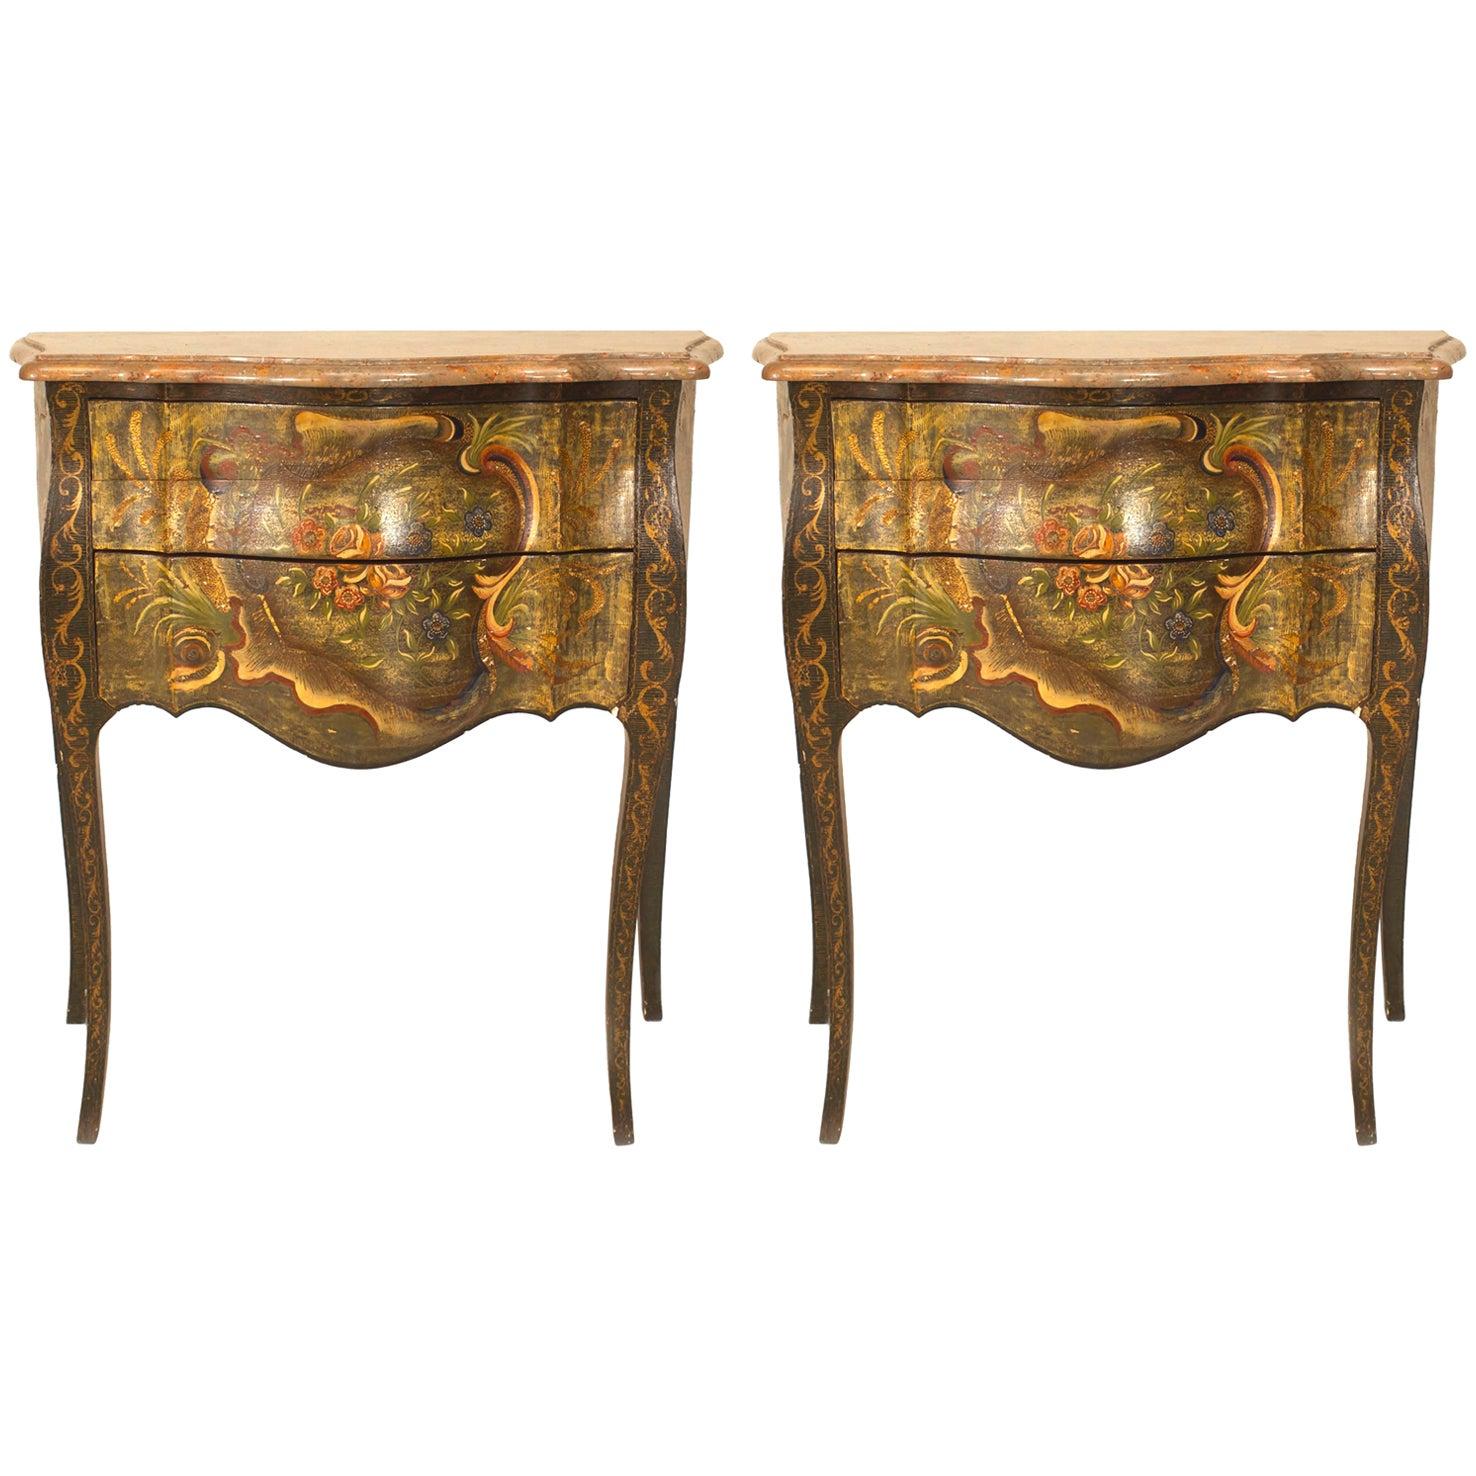 Pair of Italian Venetian '19th-20th Century' Commodes